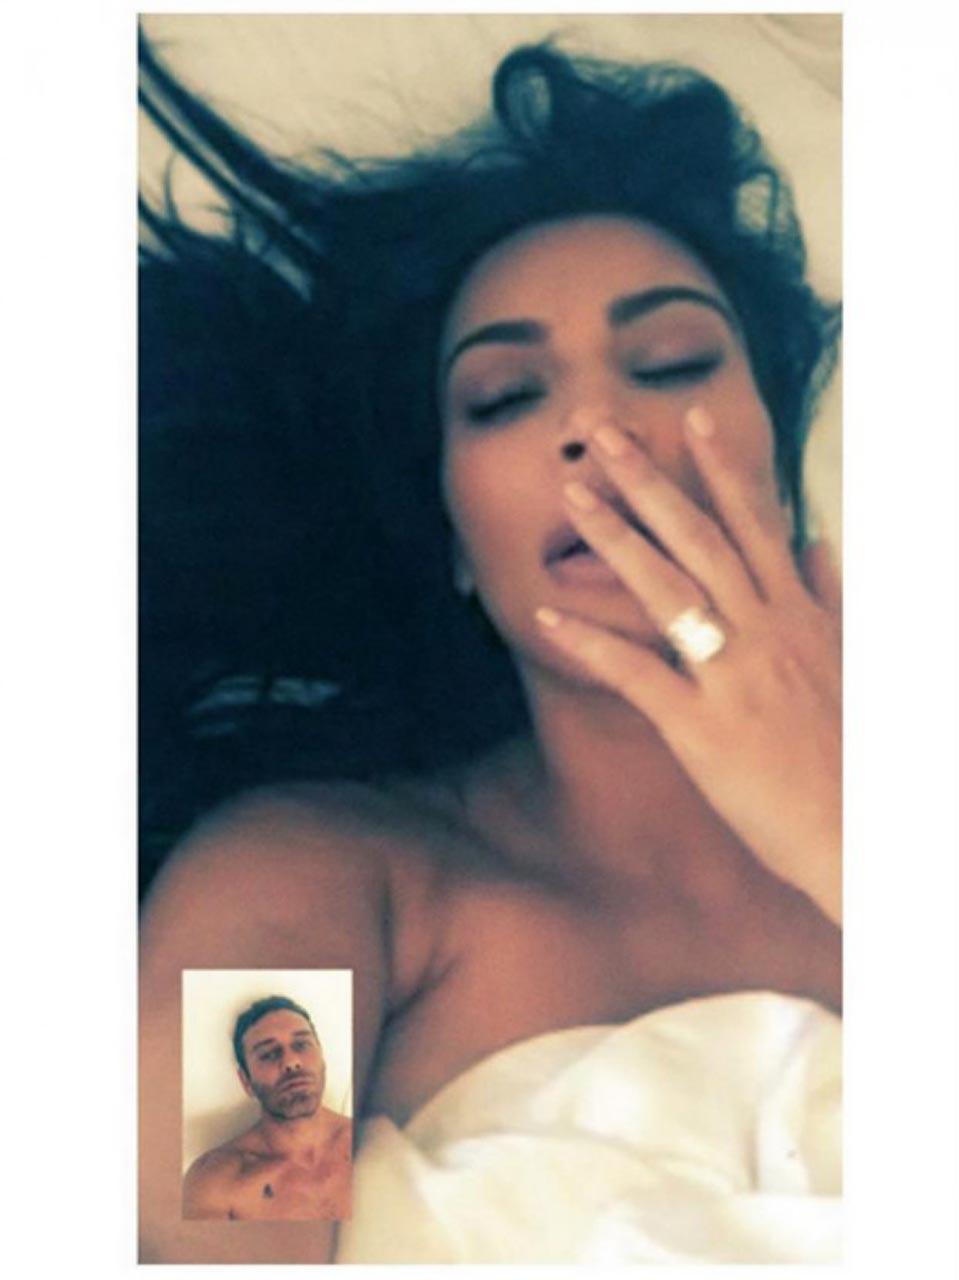 kim kardashian leaked facetime